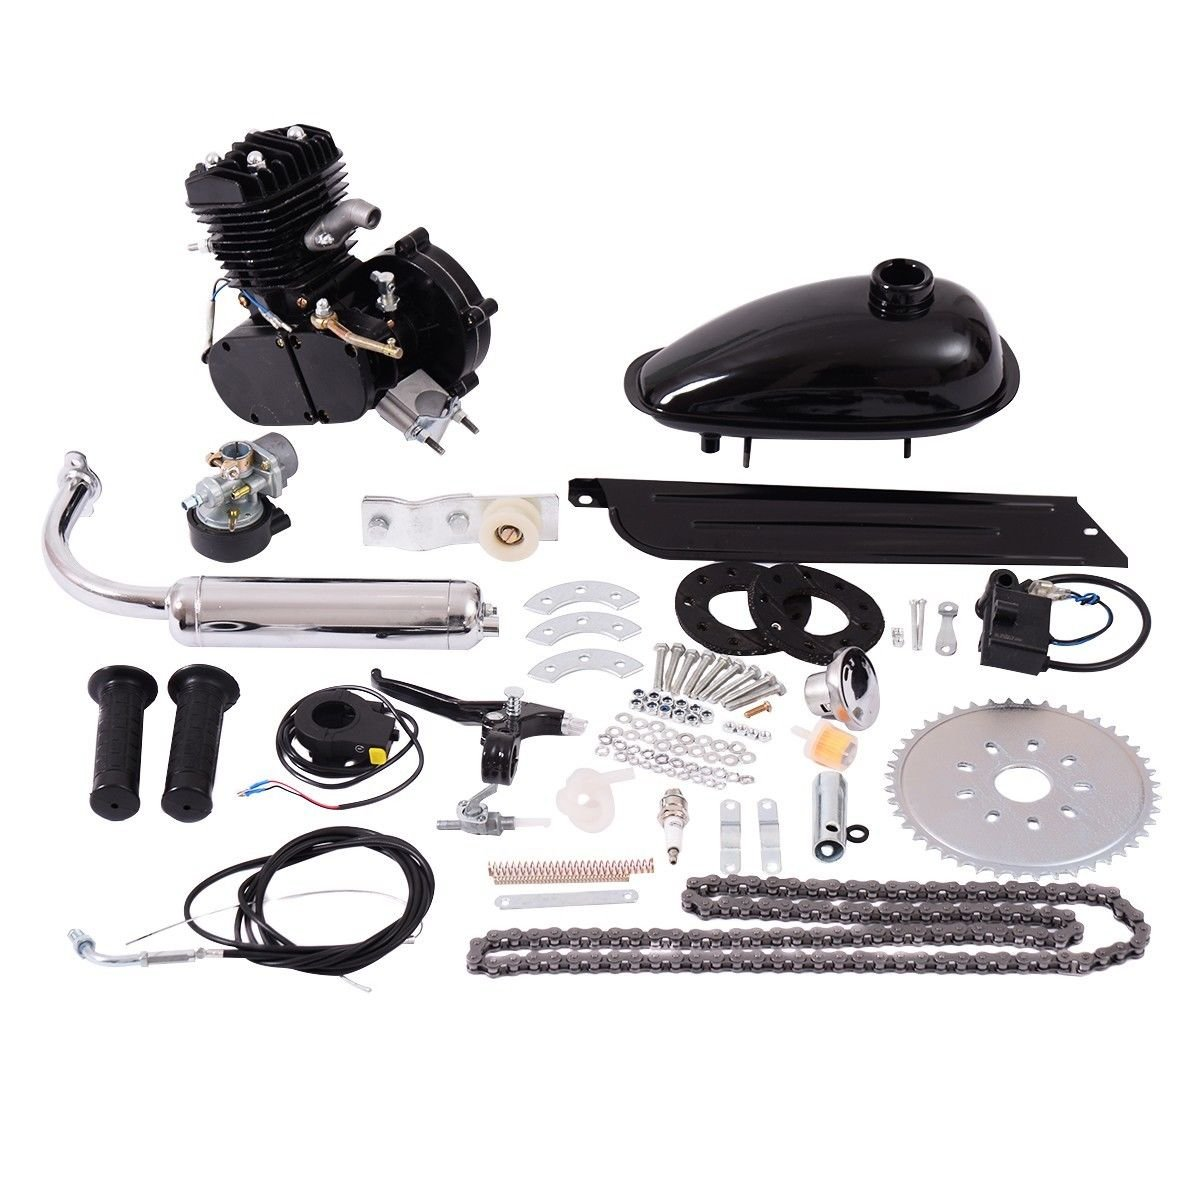 Black Bicycle Engine Motor Kit w/Spark Plug